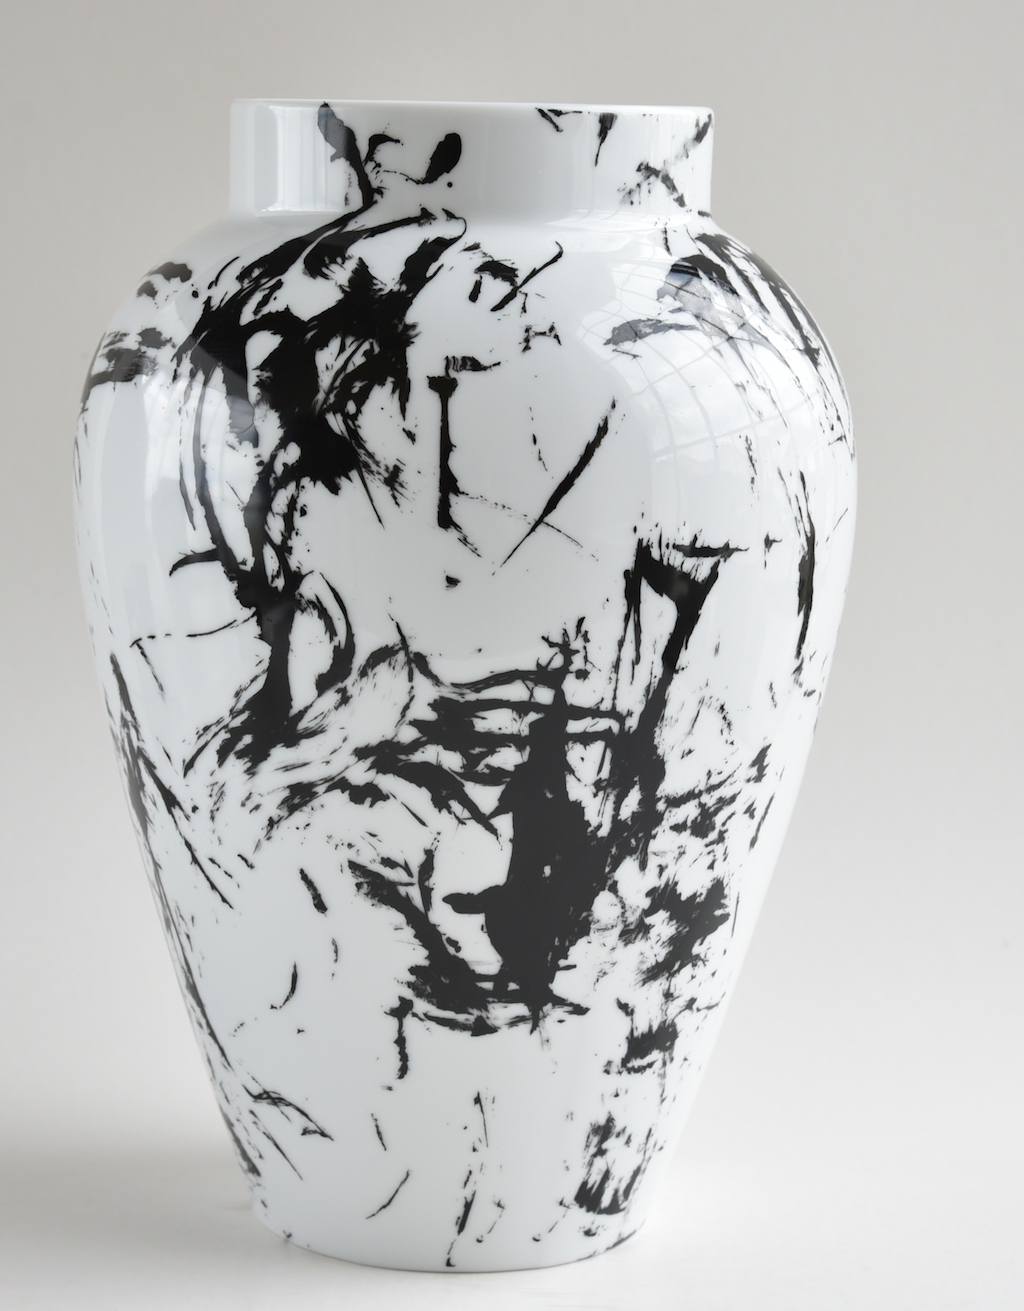 Bernardaud Tuscan Vase Zao Wou-Ki (30 cm)